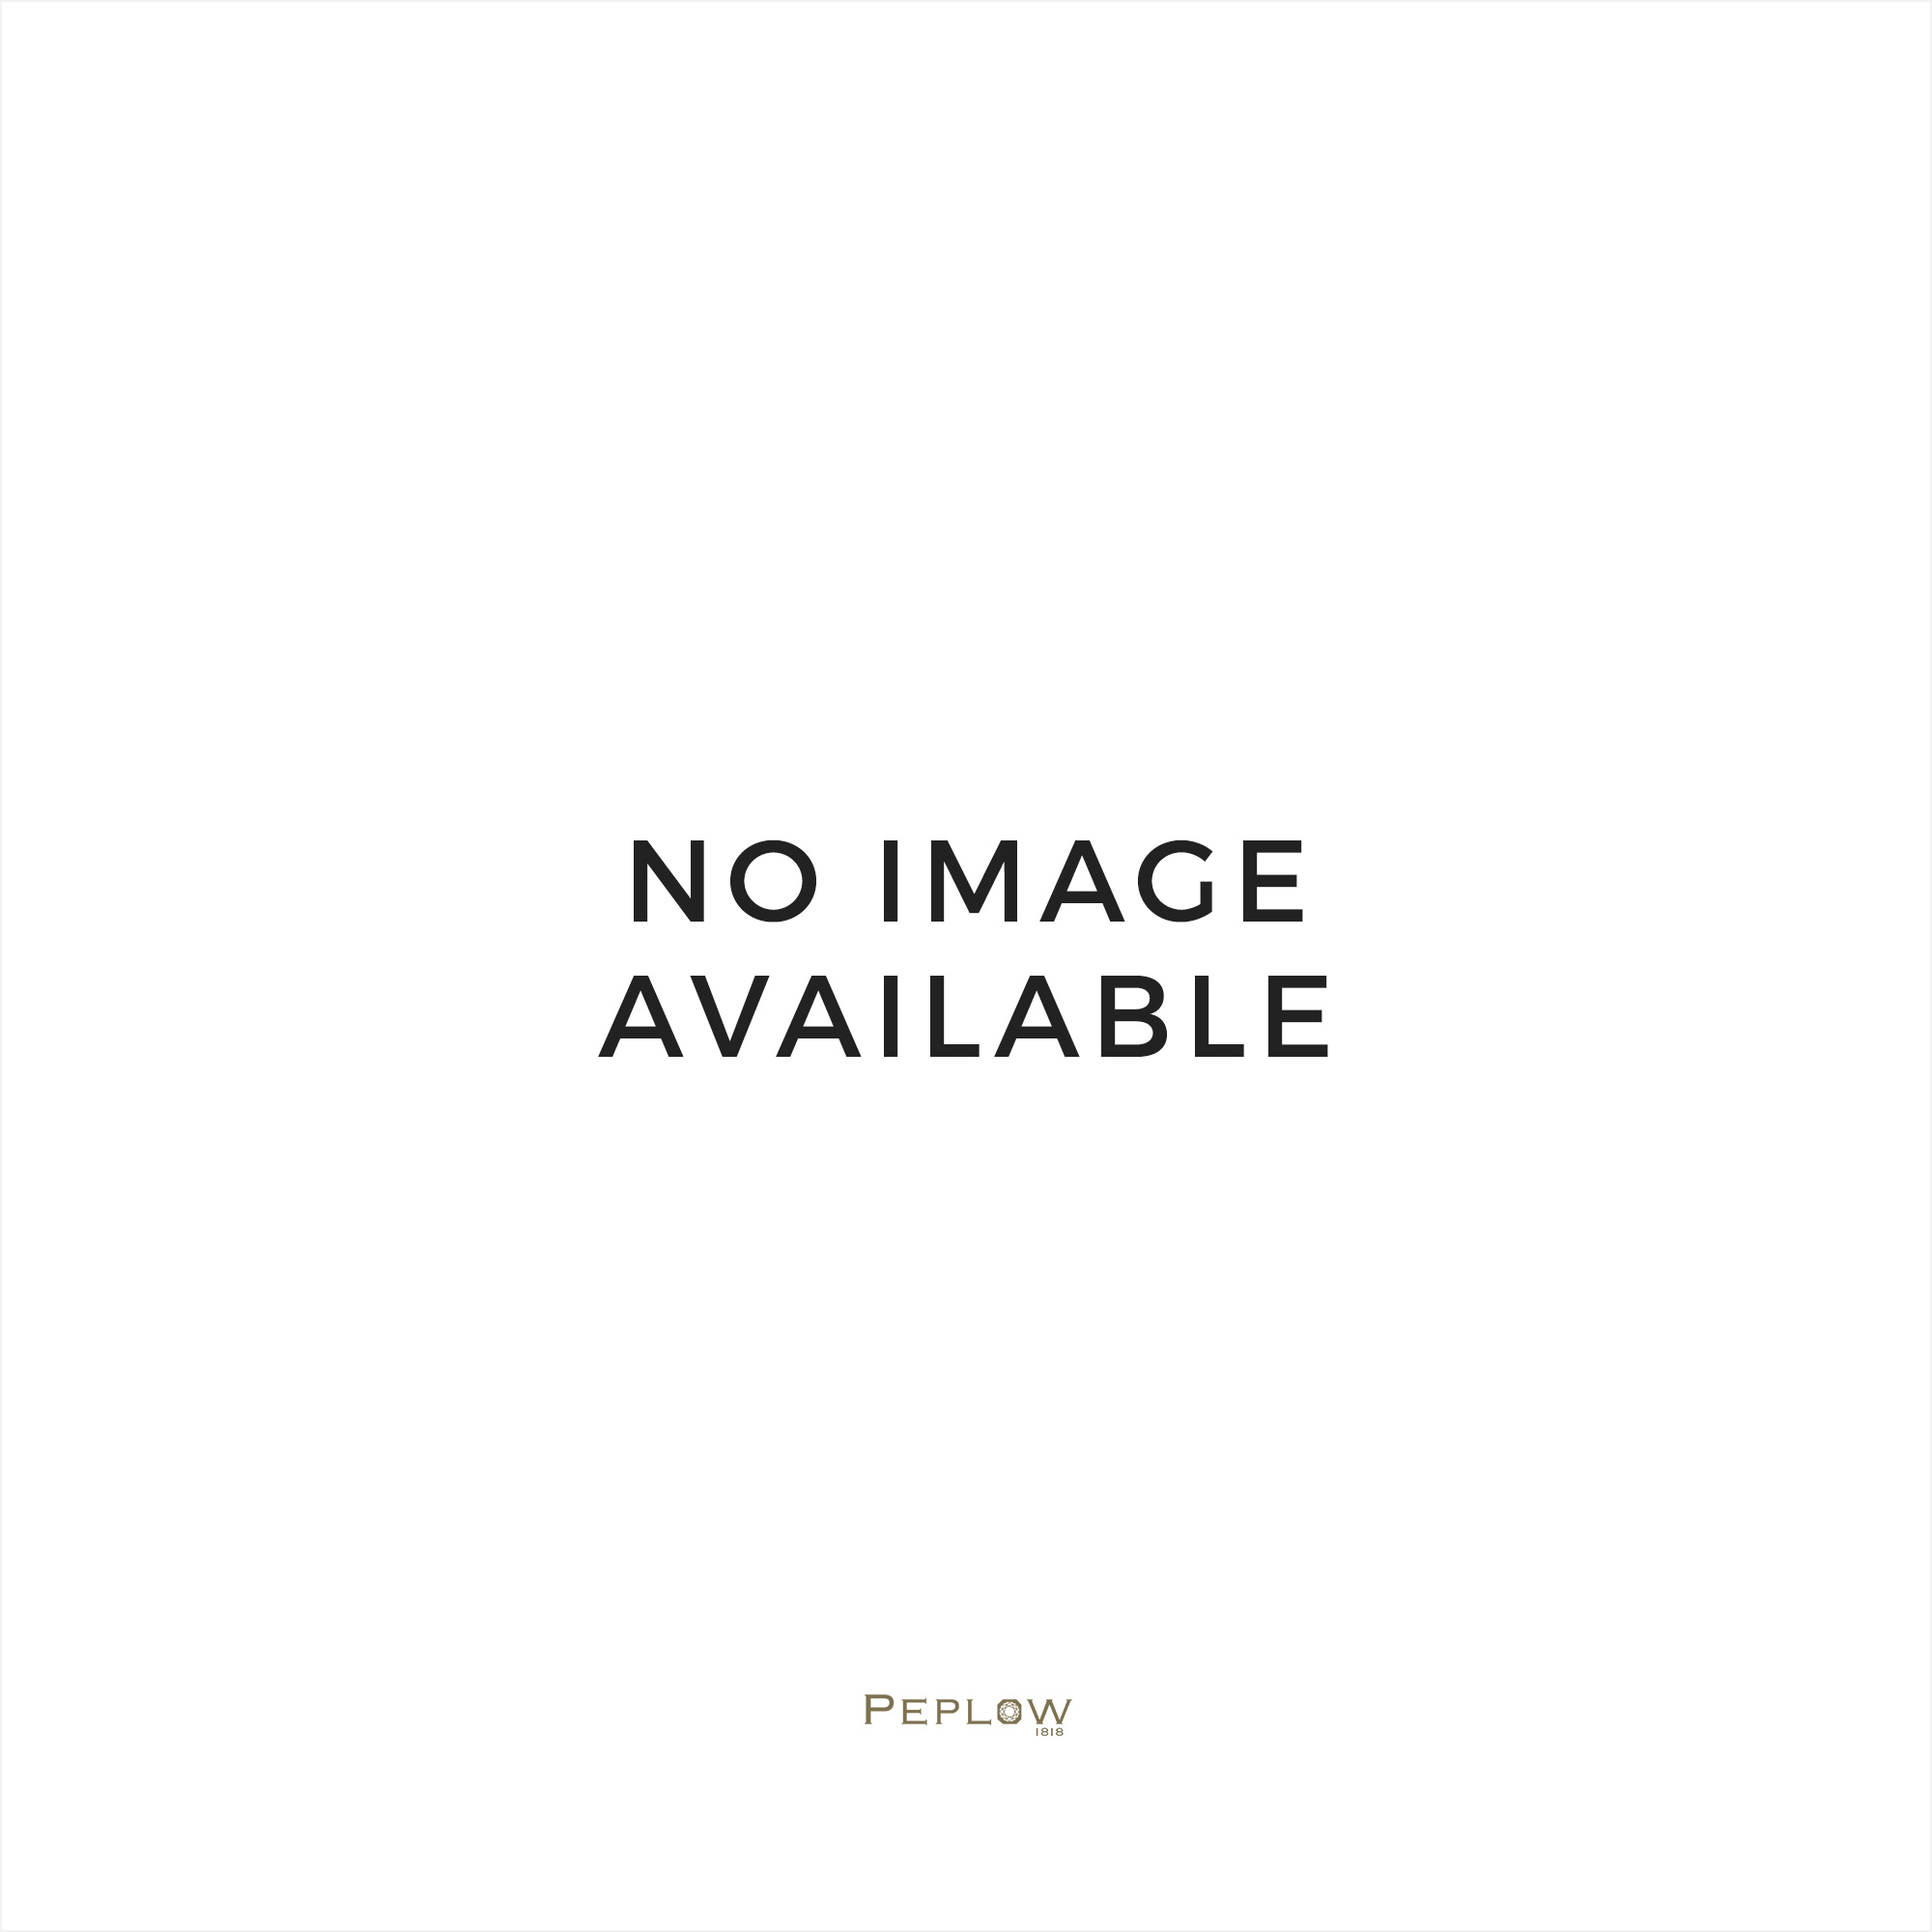 Seiko Watches Seiko Ladies Gold Plated Champagne Baton Dial Watch